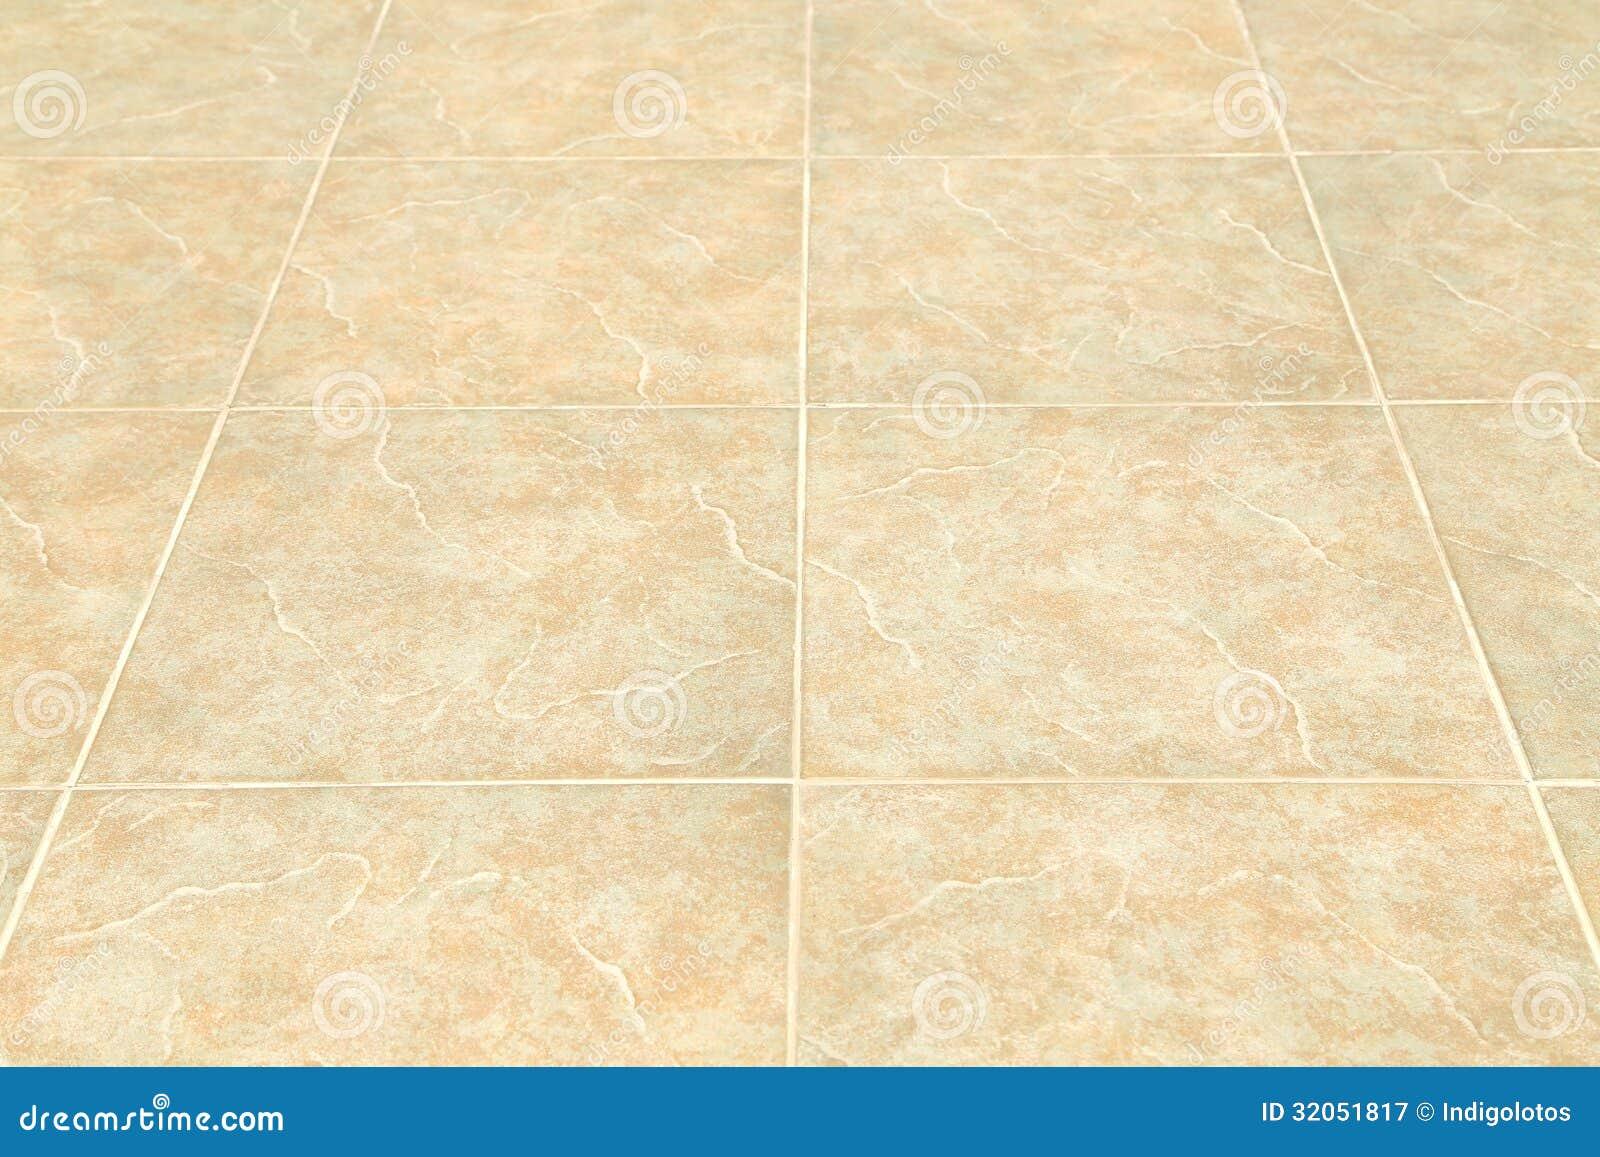 Brown ceramic floor tiles closeup texture stock image image of brown ceramic floor tiles closeup texture dailygadgetfo Image collections